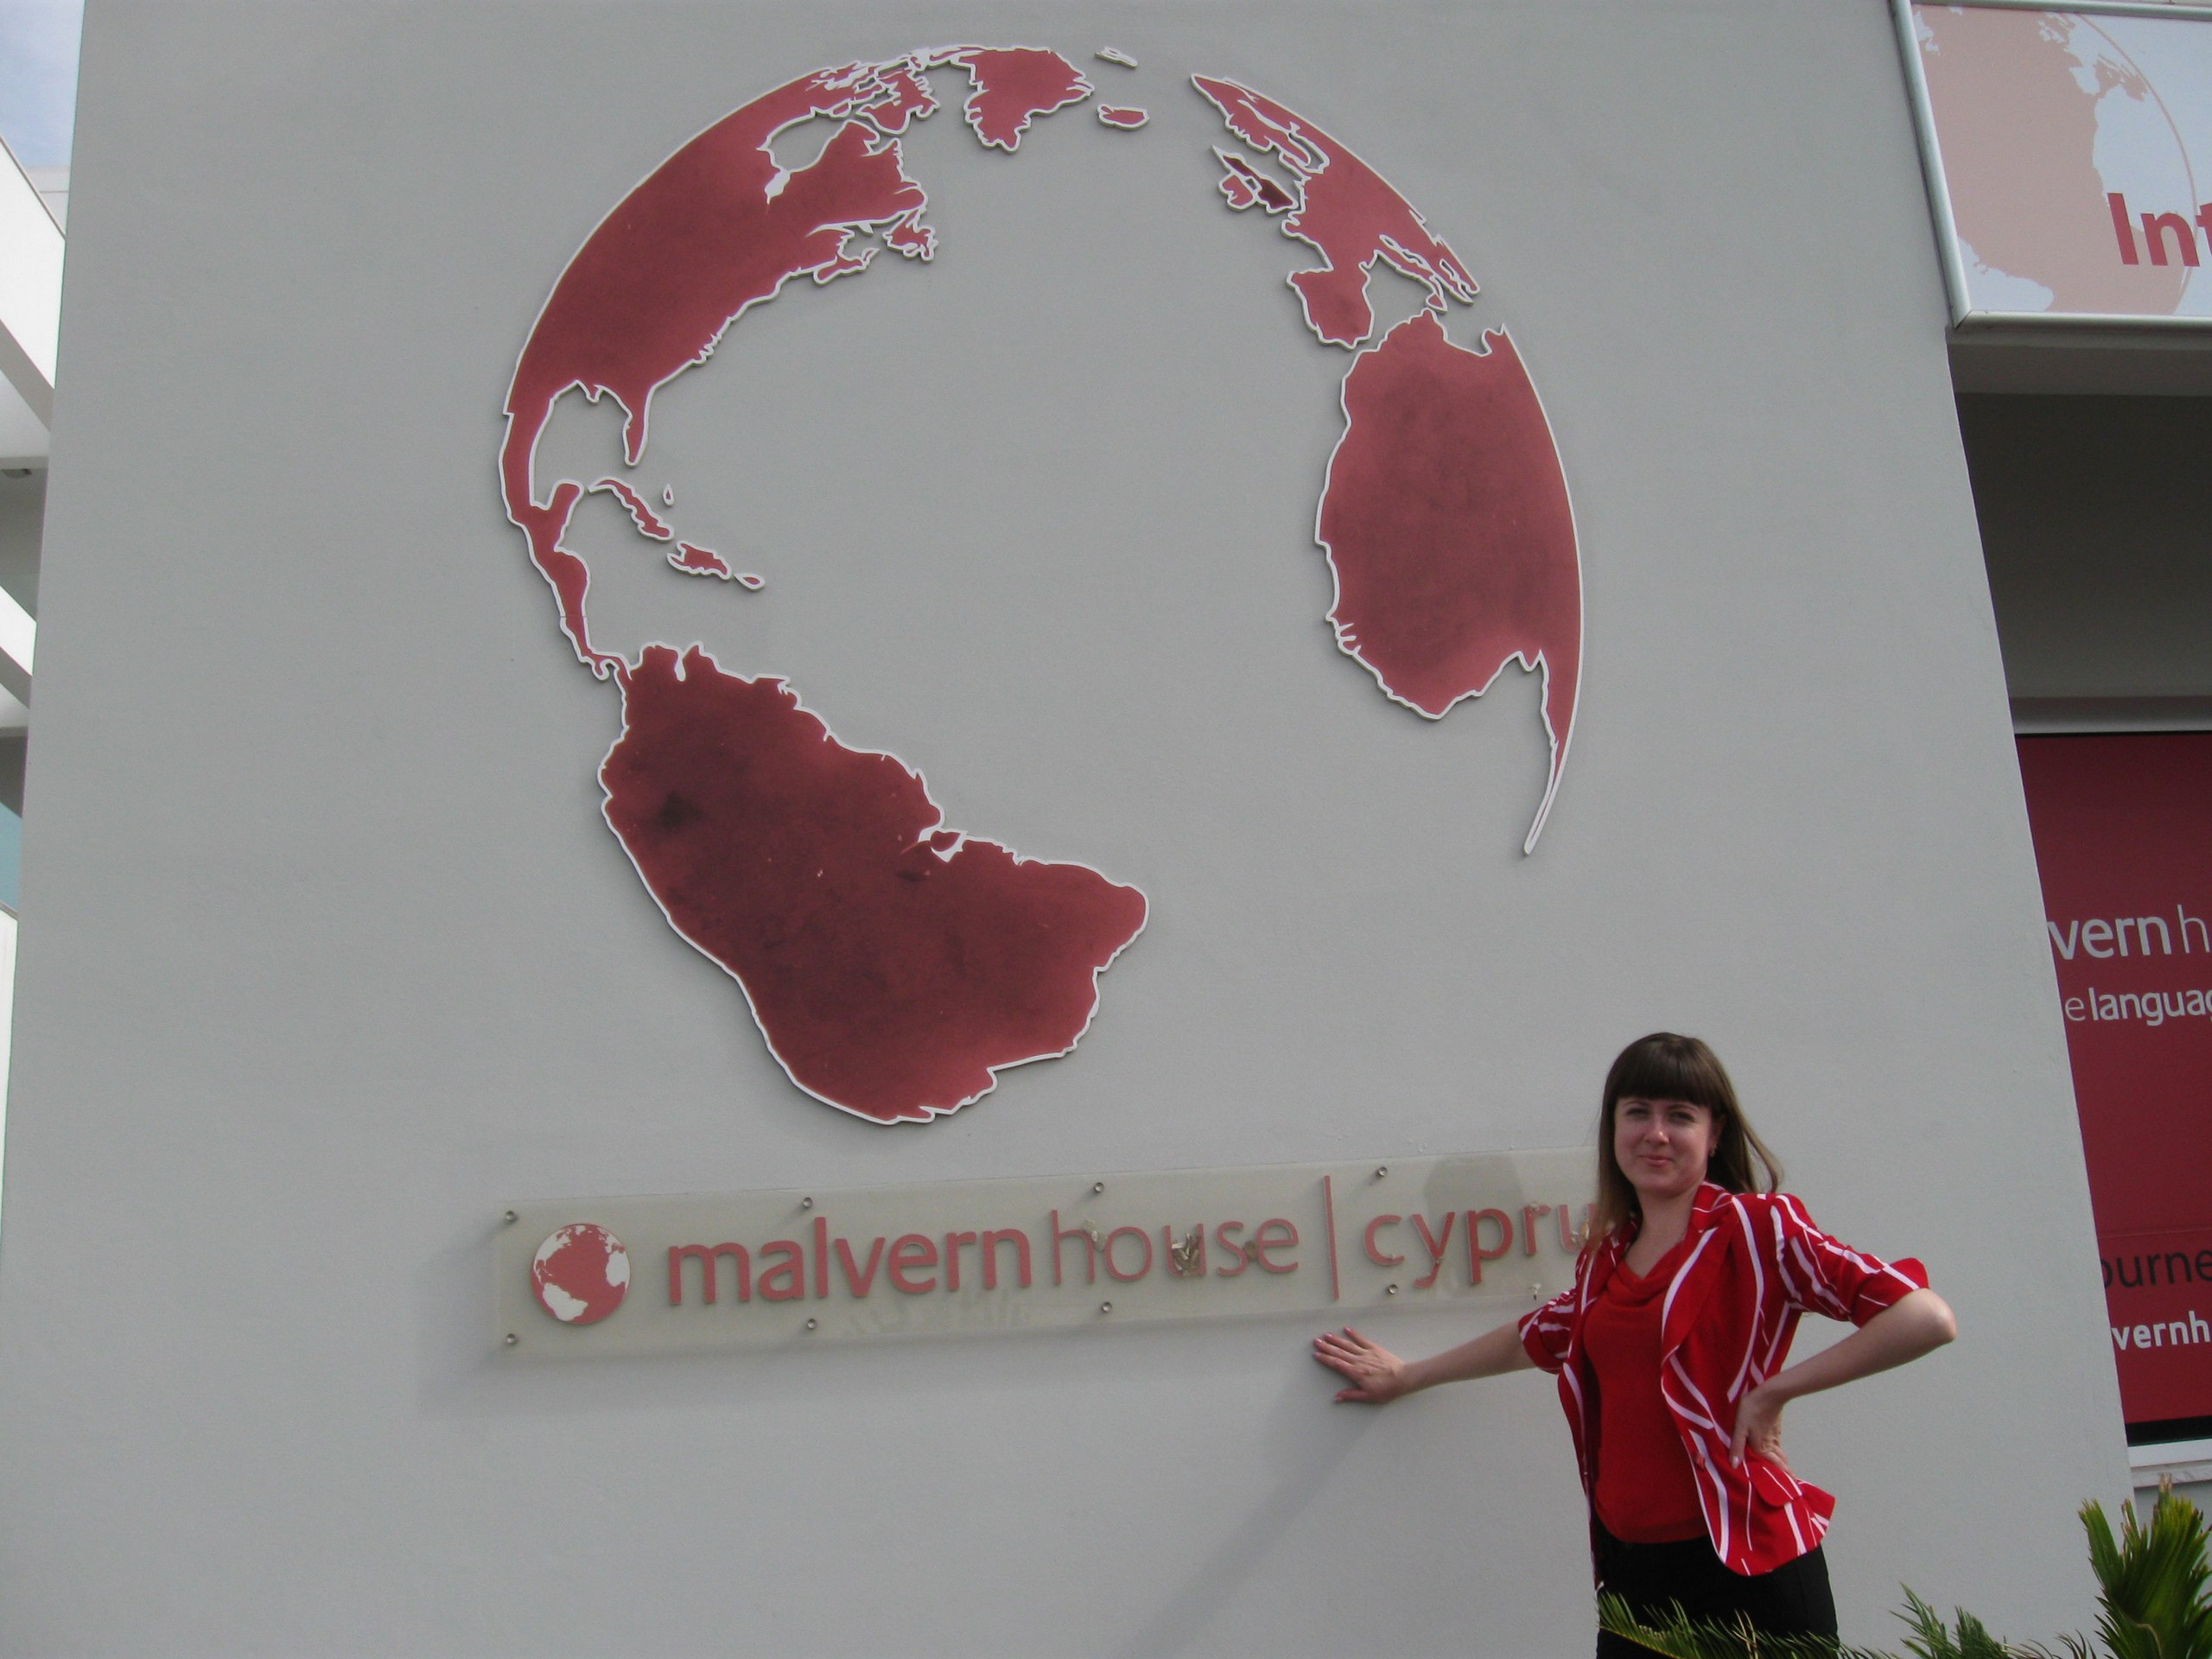 malvern_house_cyprus